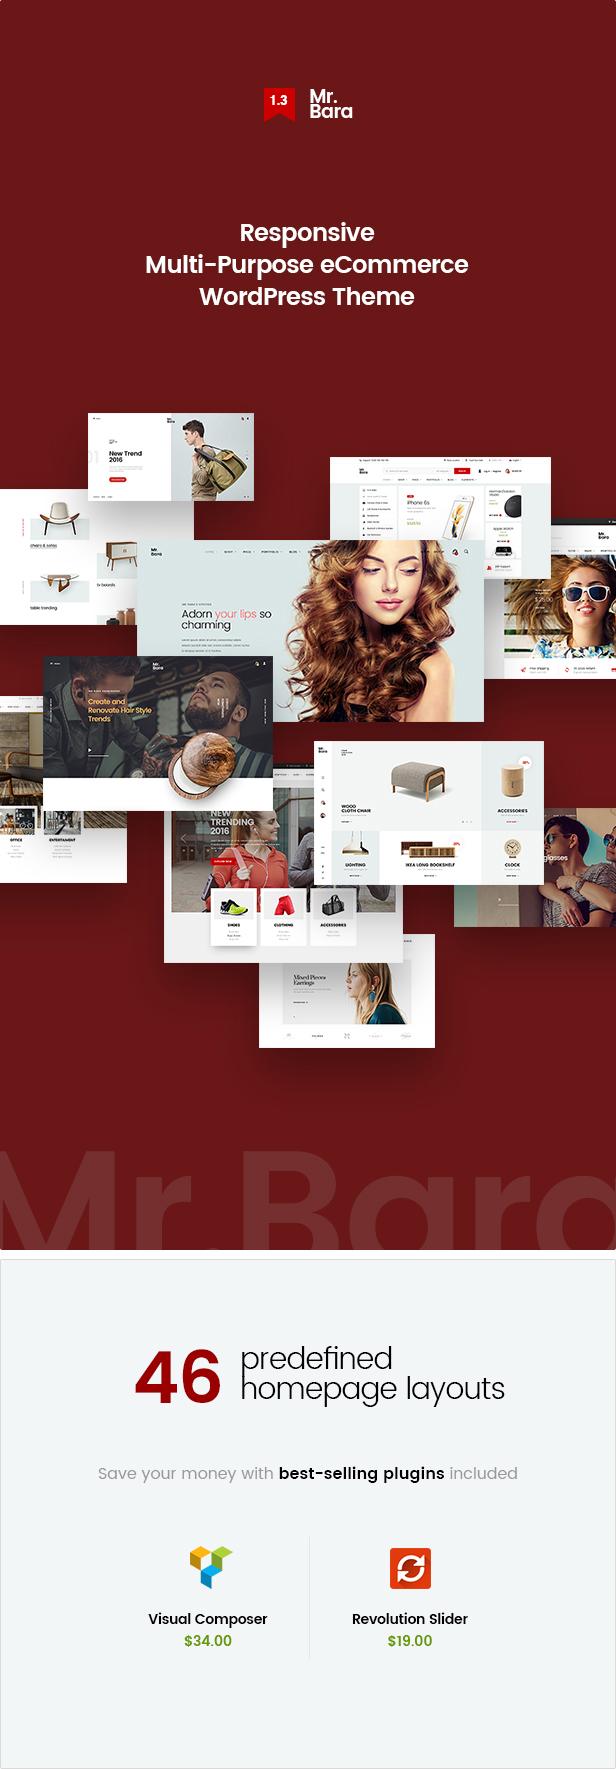 Mr.Bara - Responsive Multi-Purpose eCommerce WordPress Theme - 6